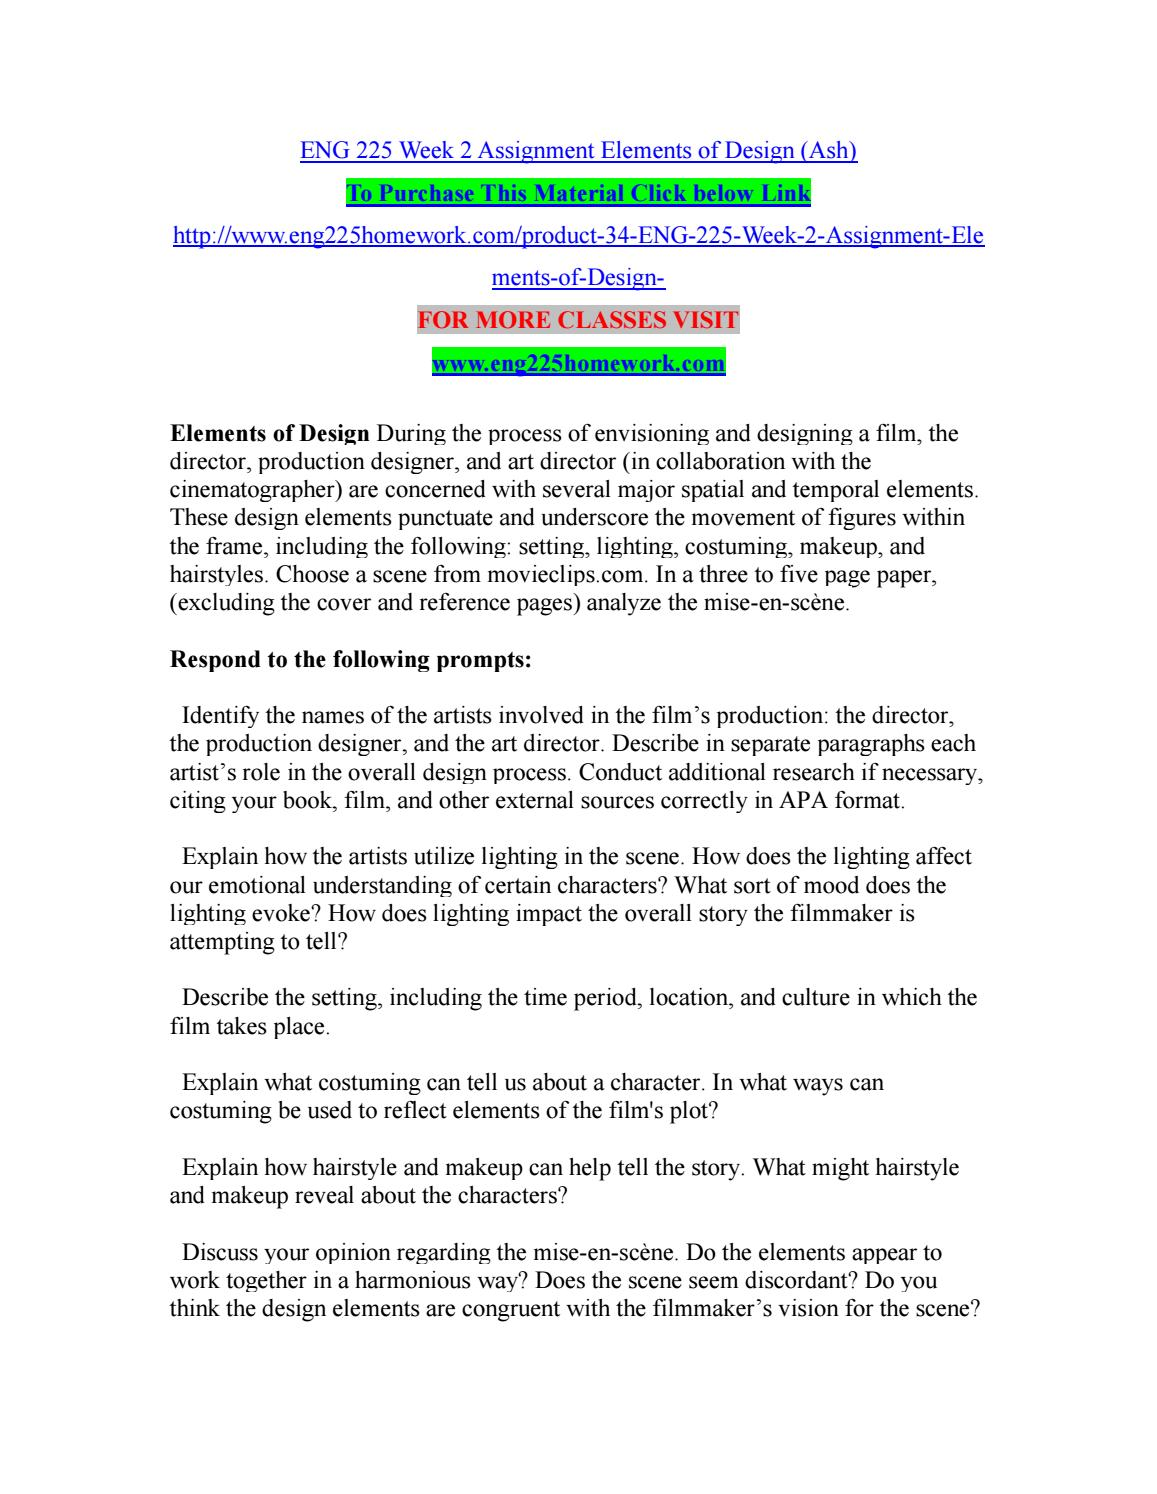 Current and Novel Treatment method for Type 1Diabetes Mellitus. dissertations online